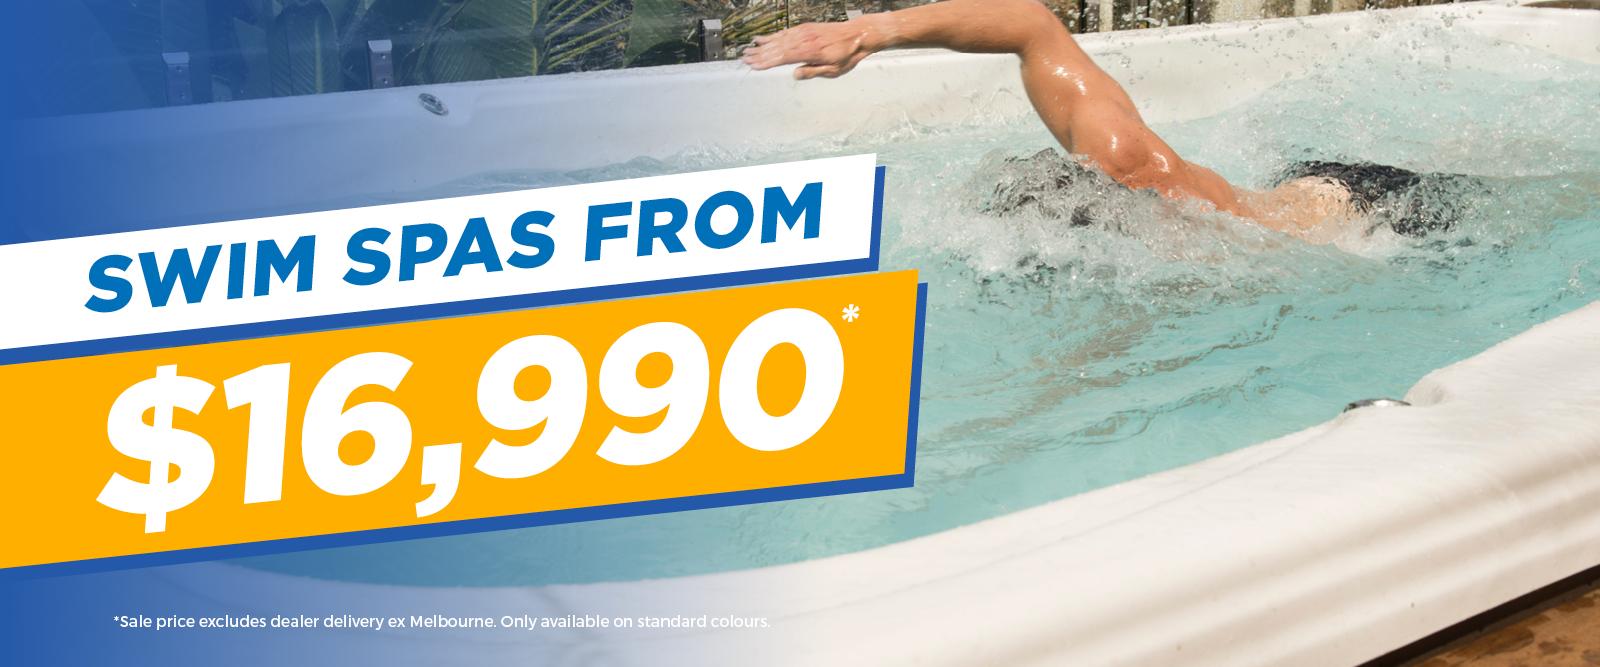 Swim Spas From $16,990